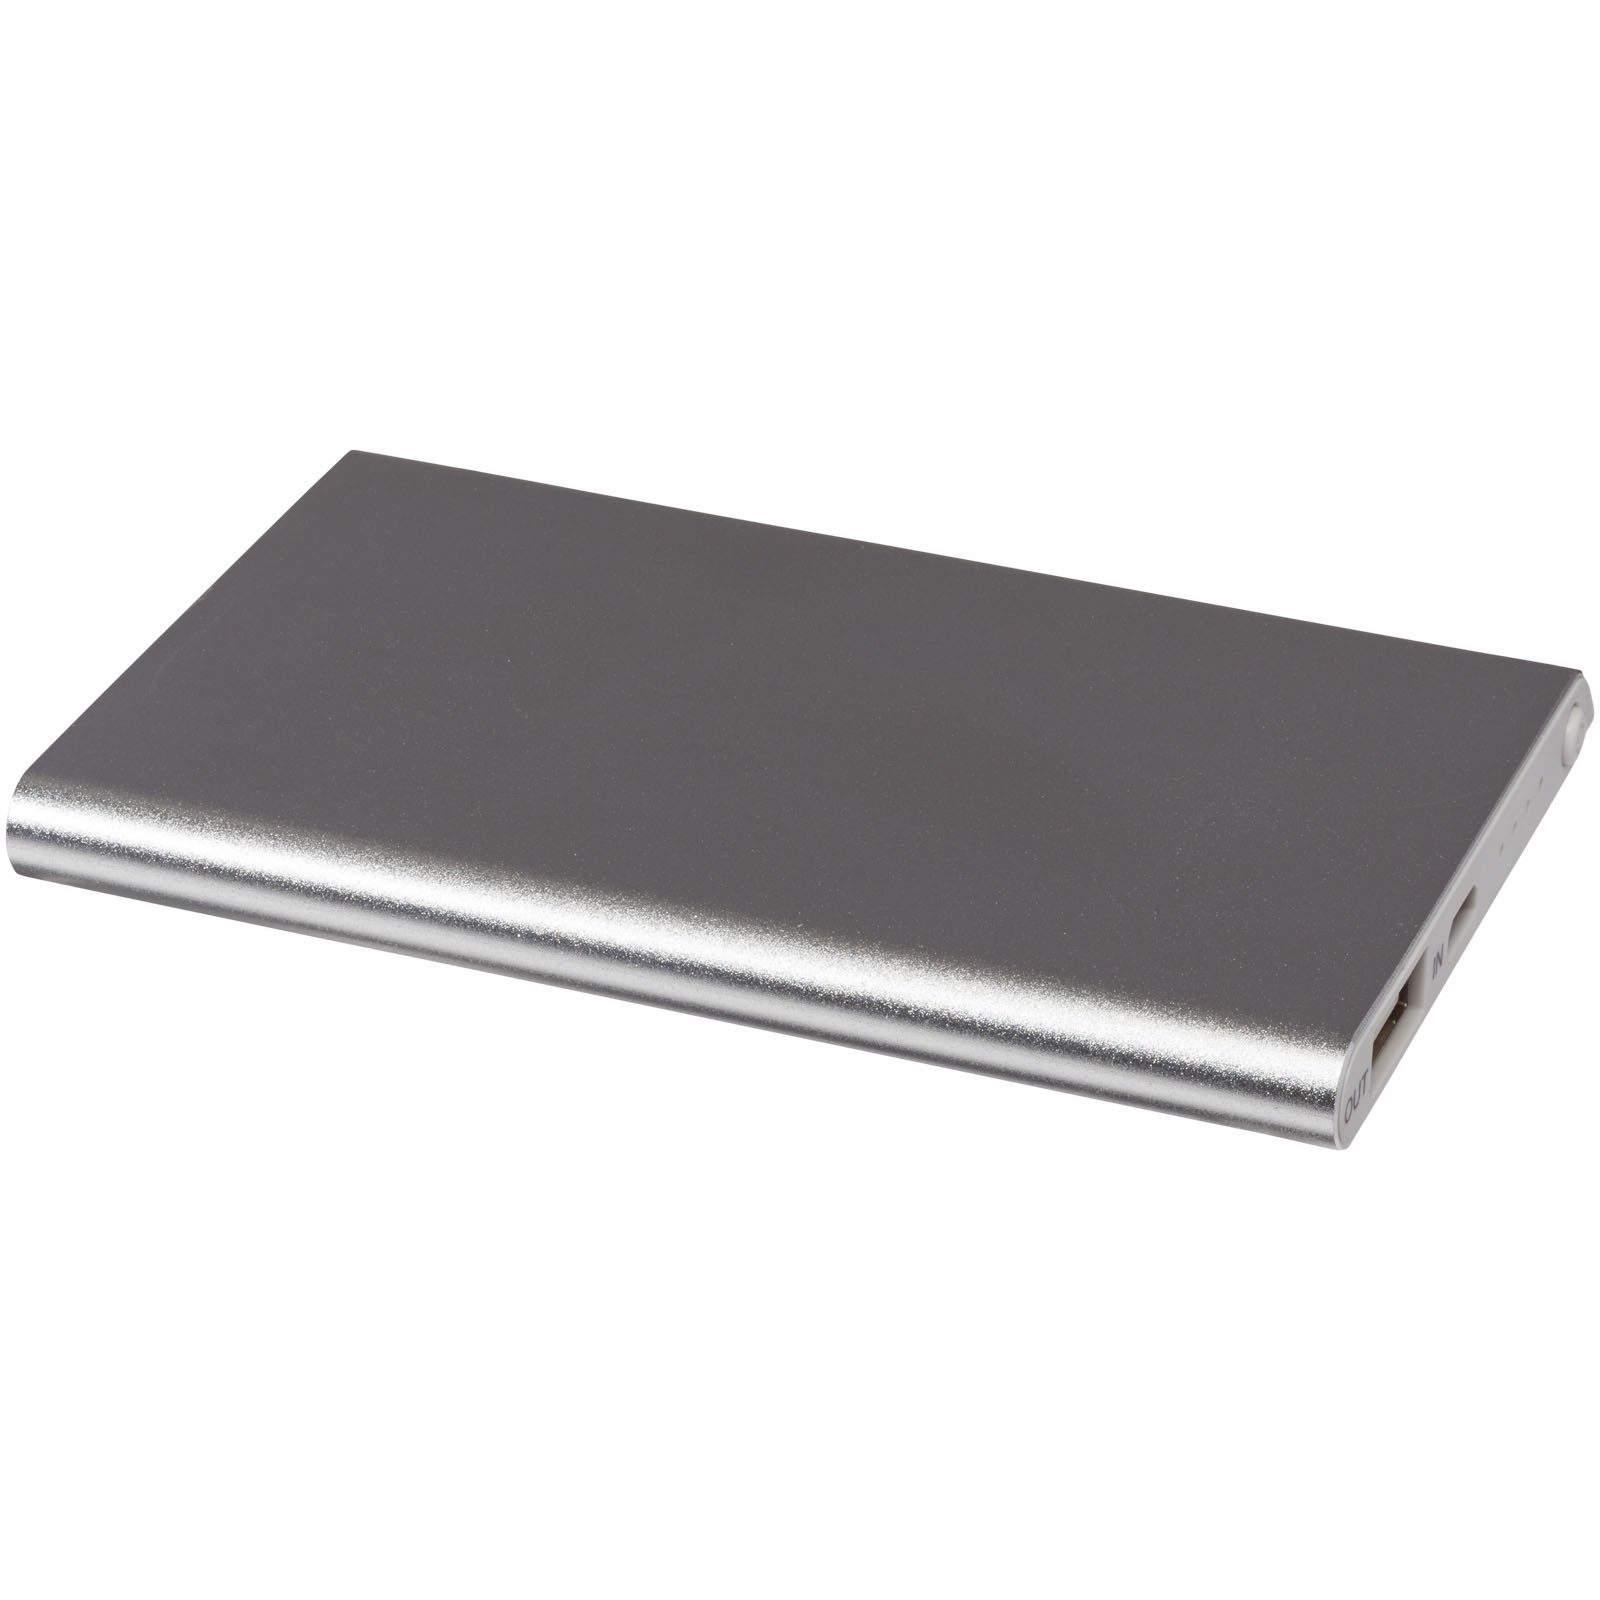 Pep 4000 mAh power bank - Silver